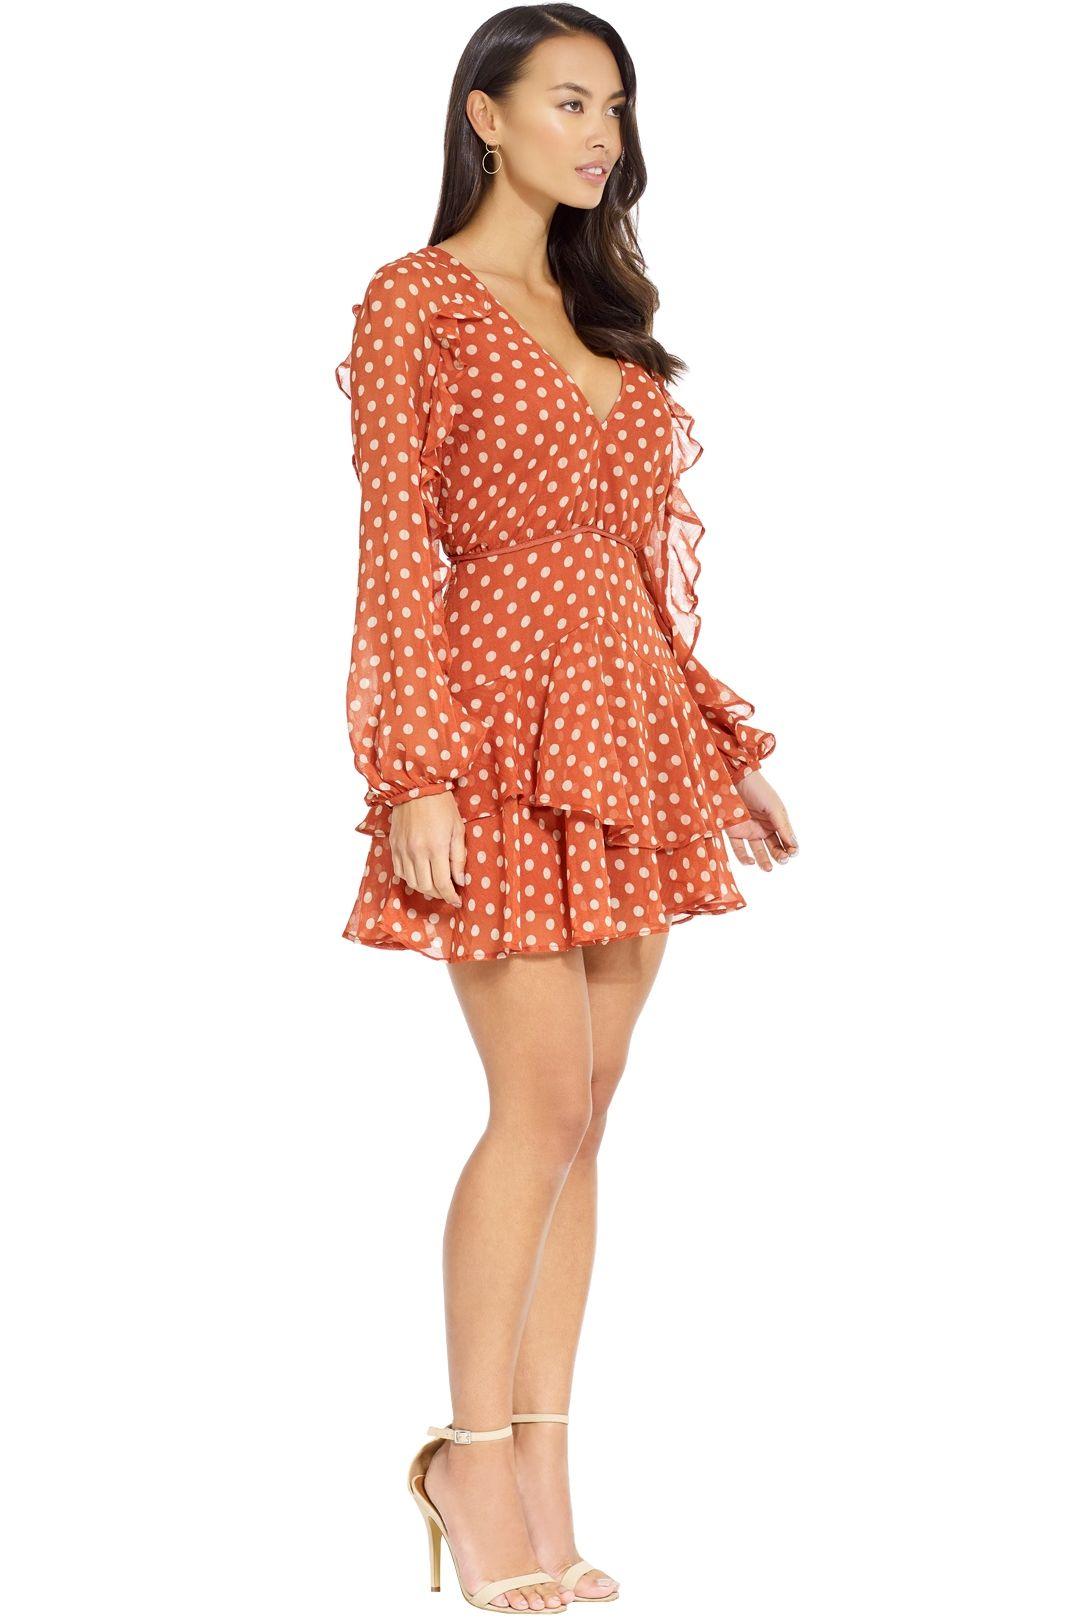 Talulah - Love Token Mini Dress - Salmon - Side